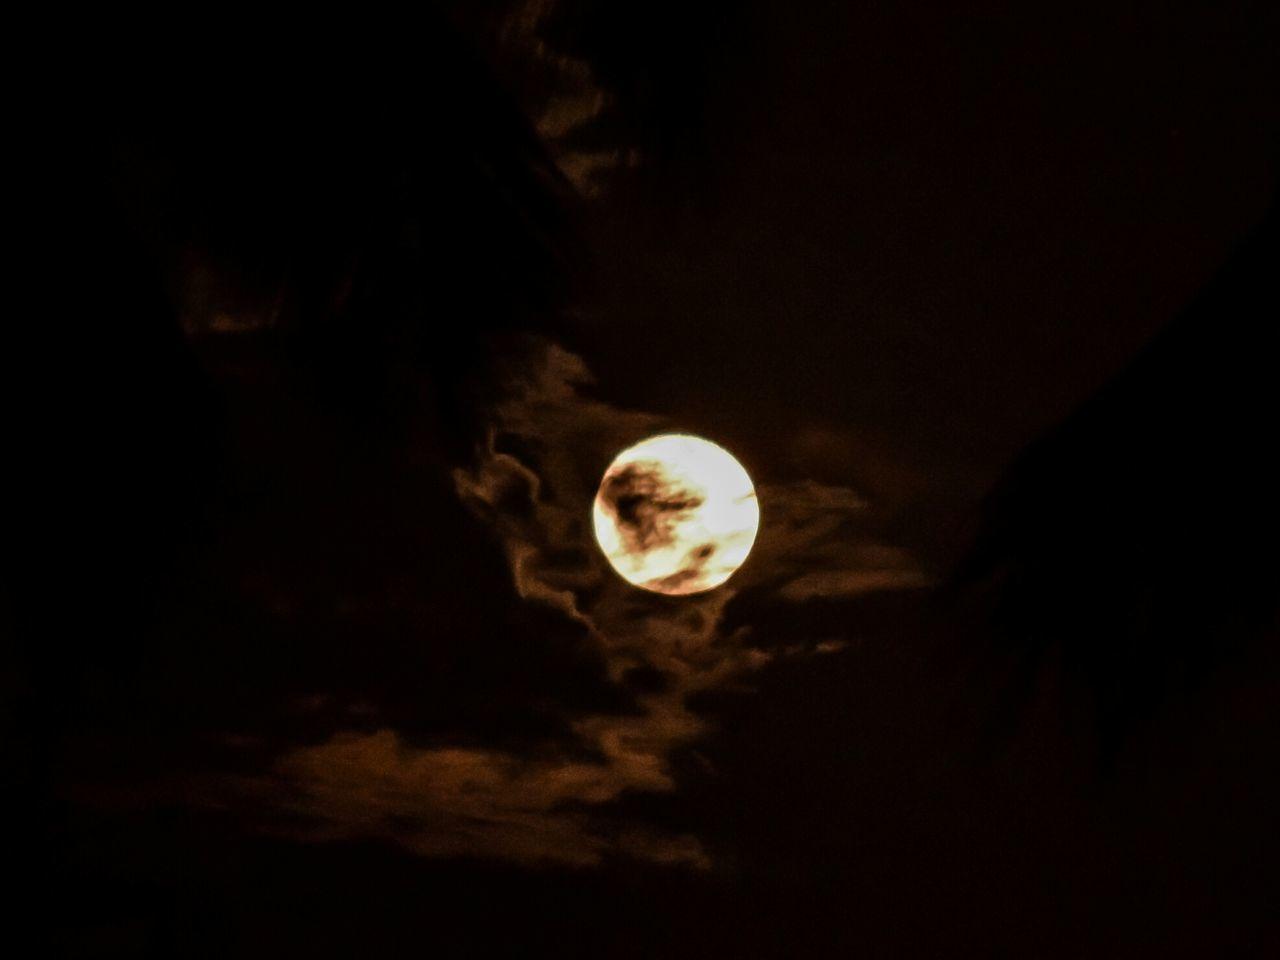 Moon Night Moonfire Astronomy